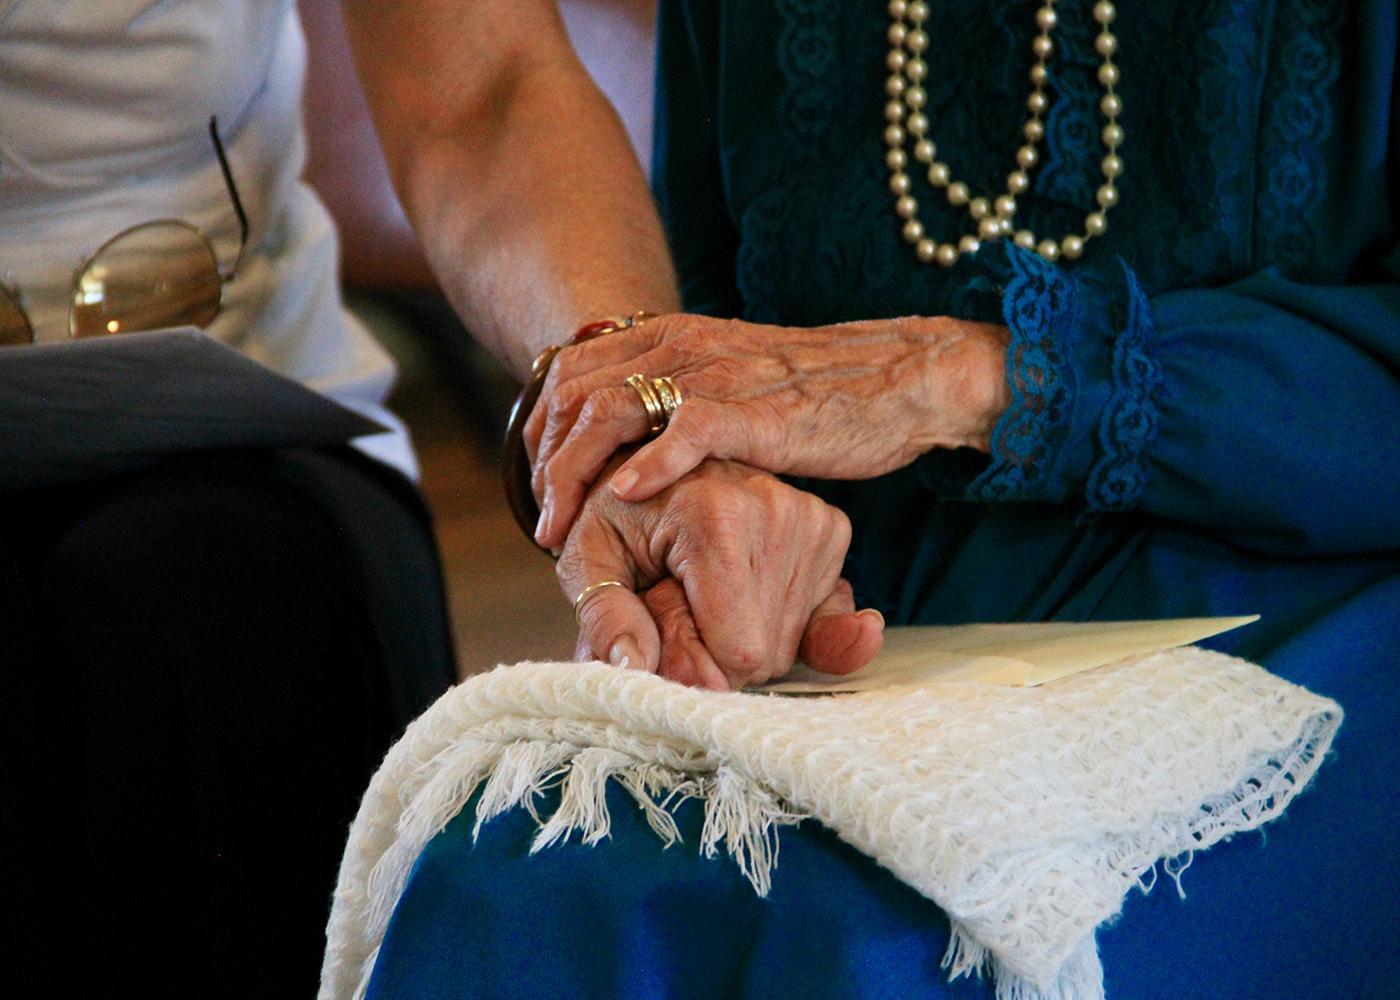 Show Your Family Love. Prevent Financial Elder Abuse. Thumbnail